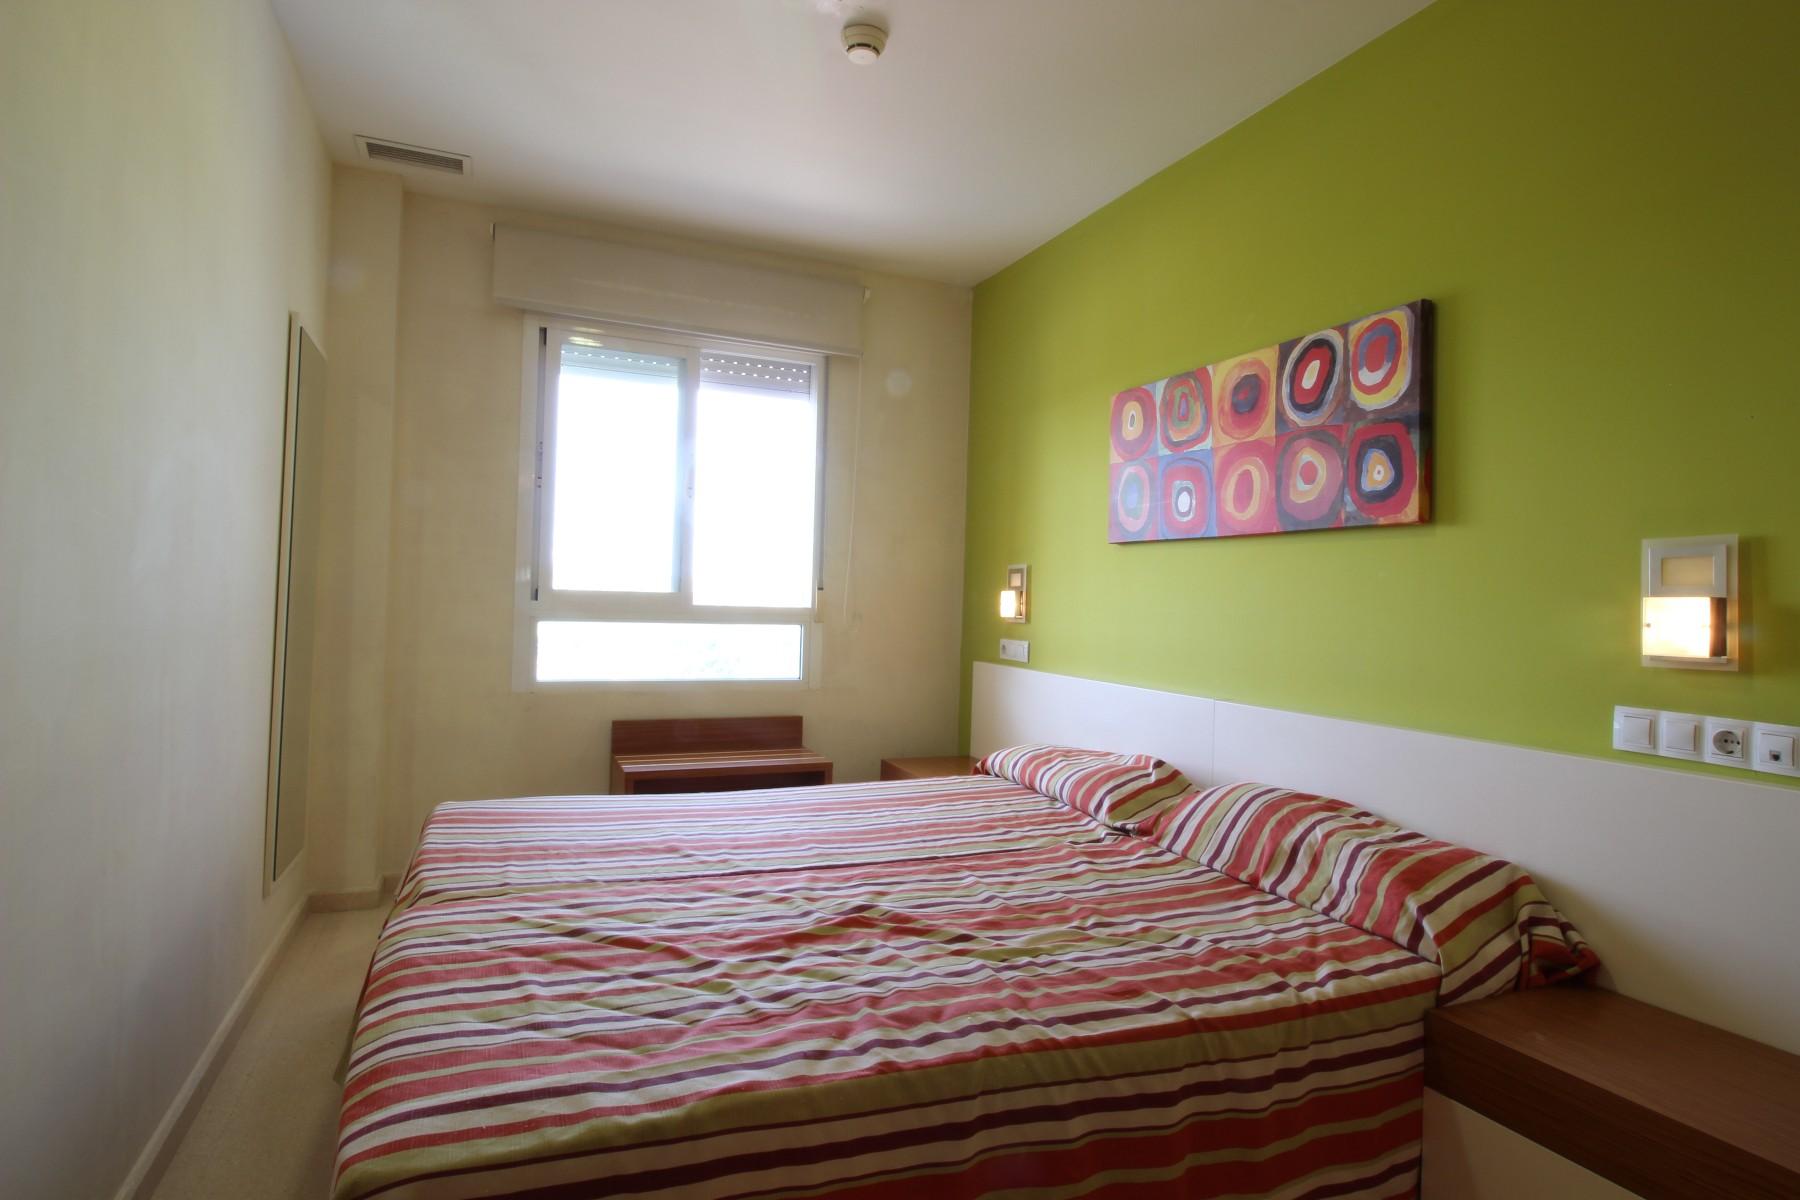 1 bedroom Apartament in Guardamar del Segura - Sort Term Rentals in Nexus Grupo